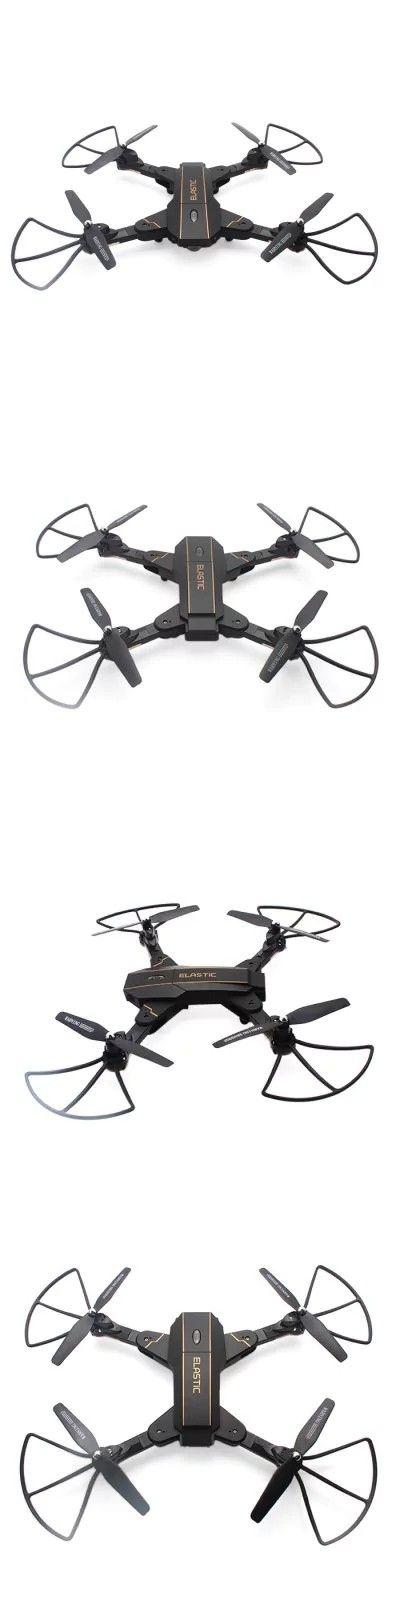 TKKJ L603 Foldable RC Drone RTF 0.3MP WiFi Camera -$59.92